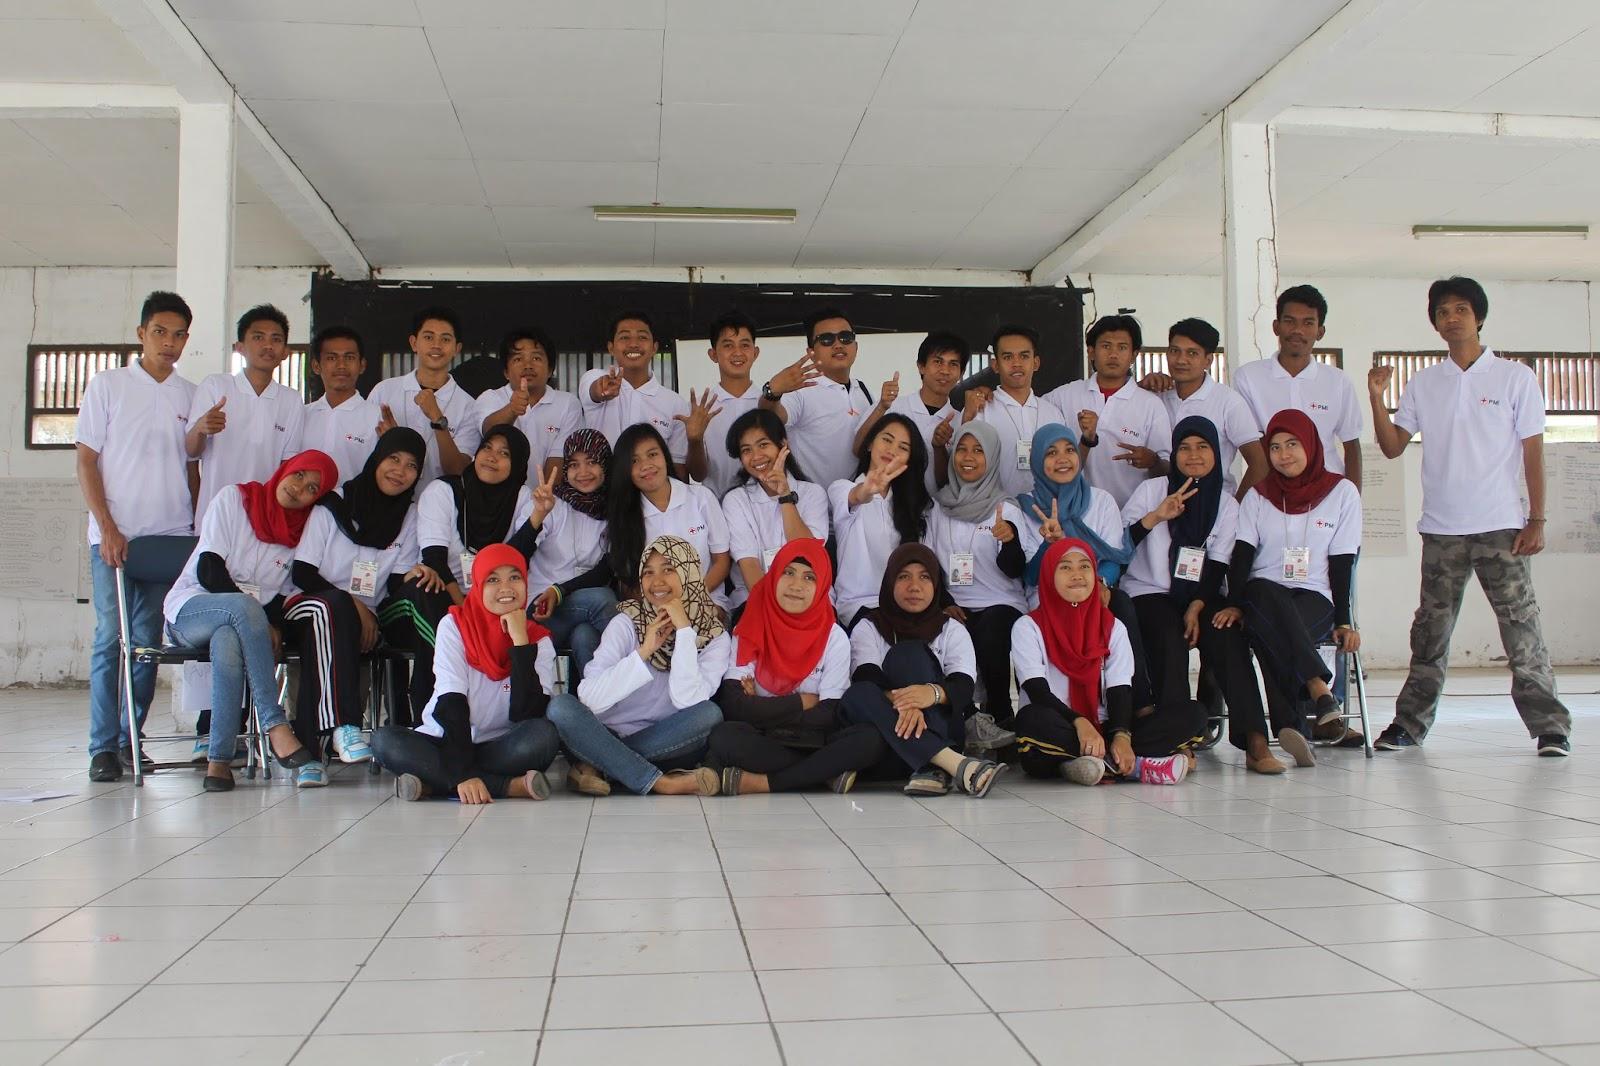 Peserta Pelatihan Spesialisasi PP KSR PMI Unit UNM Se Sulawesi Selatan 2014